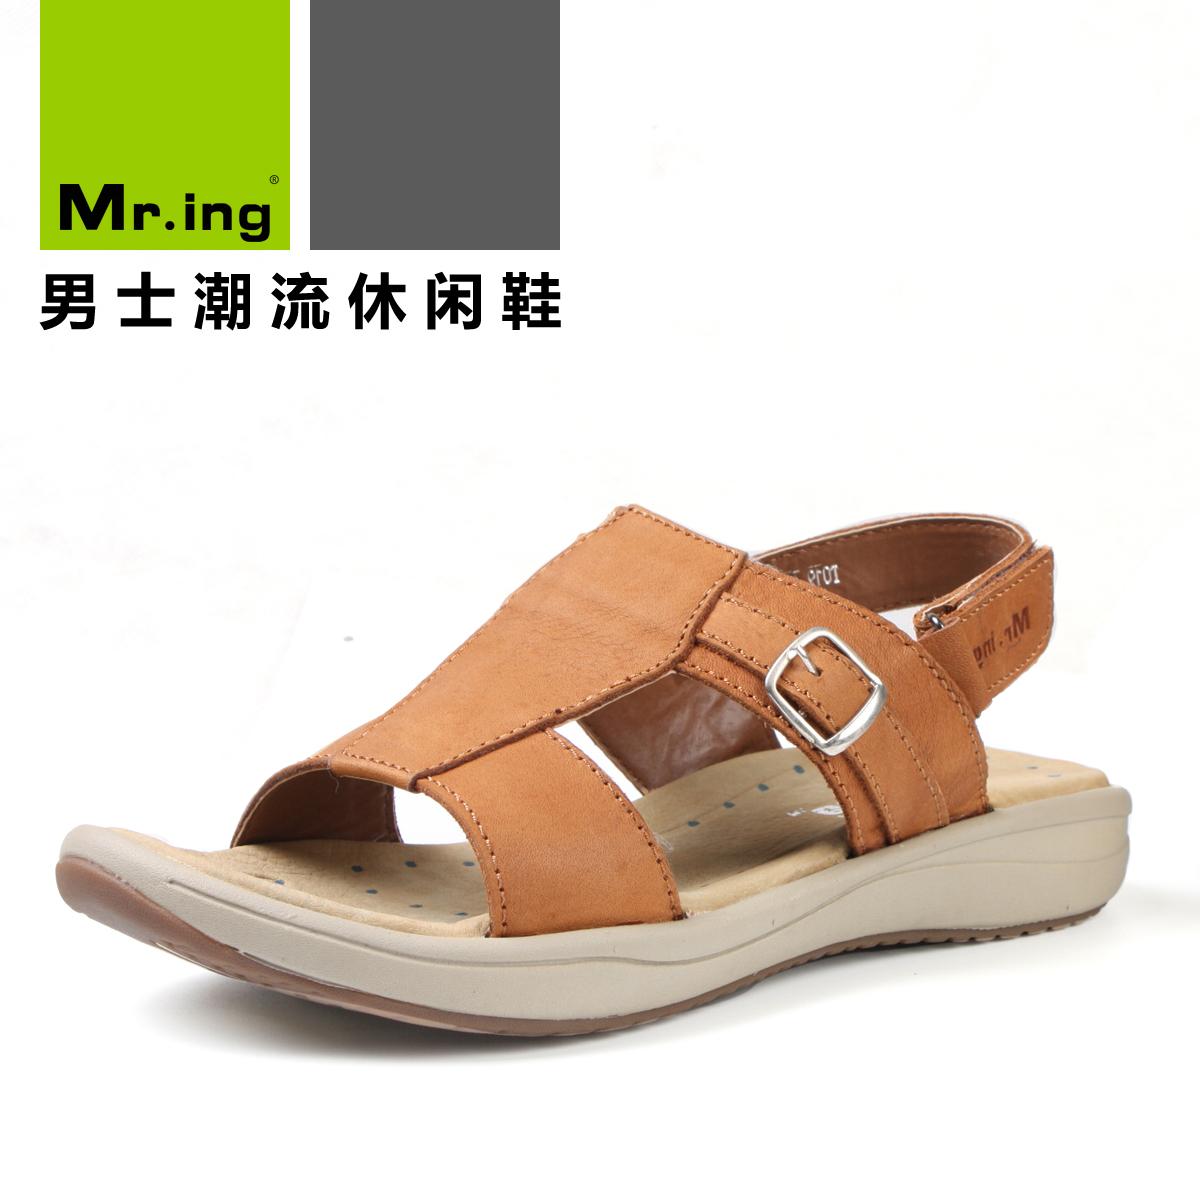 Сандали Mr. ing brand Mr.ing T019 Открытый носок Пряжка Кожа быка Лето